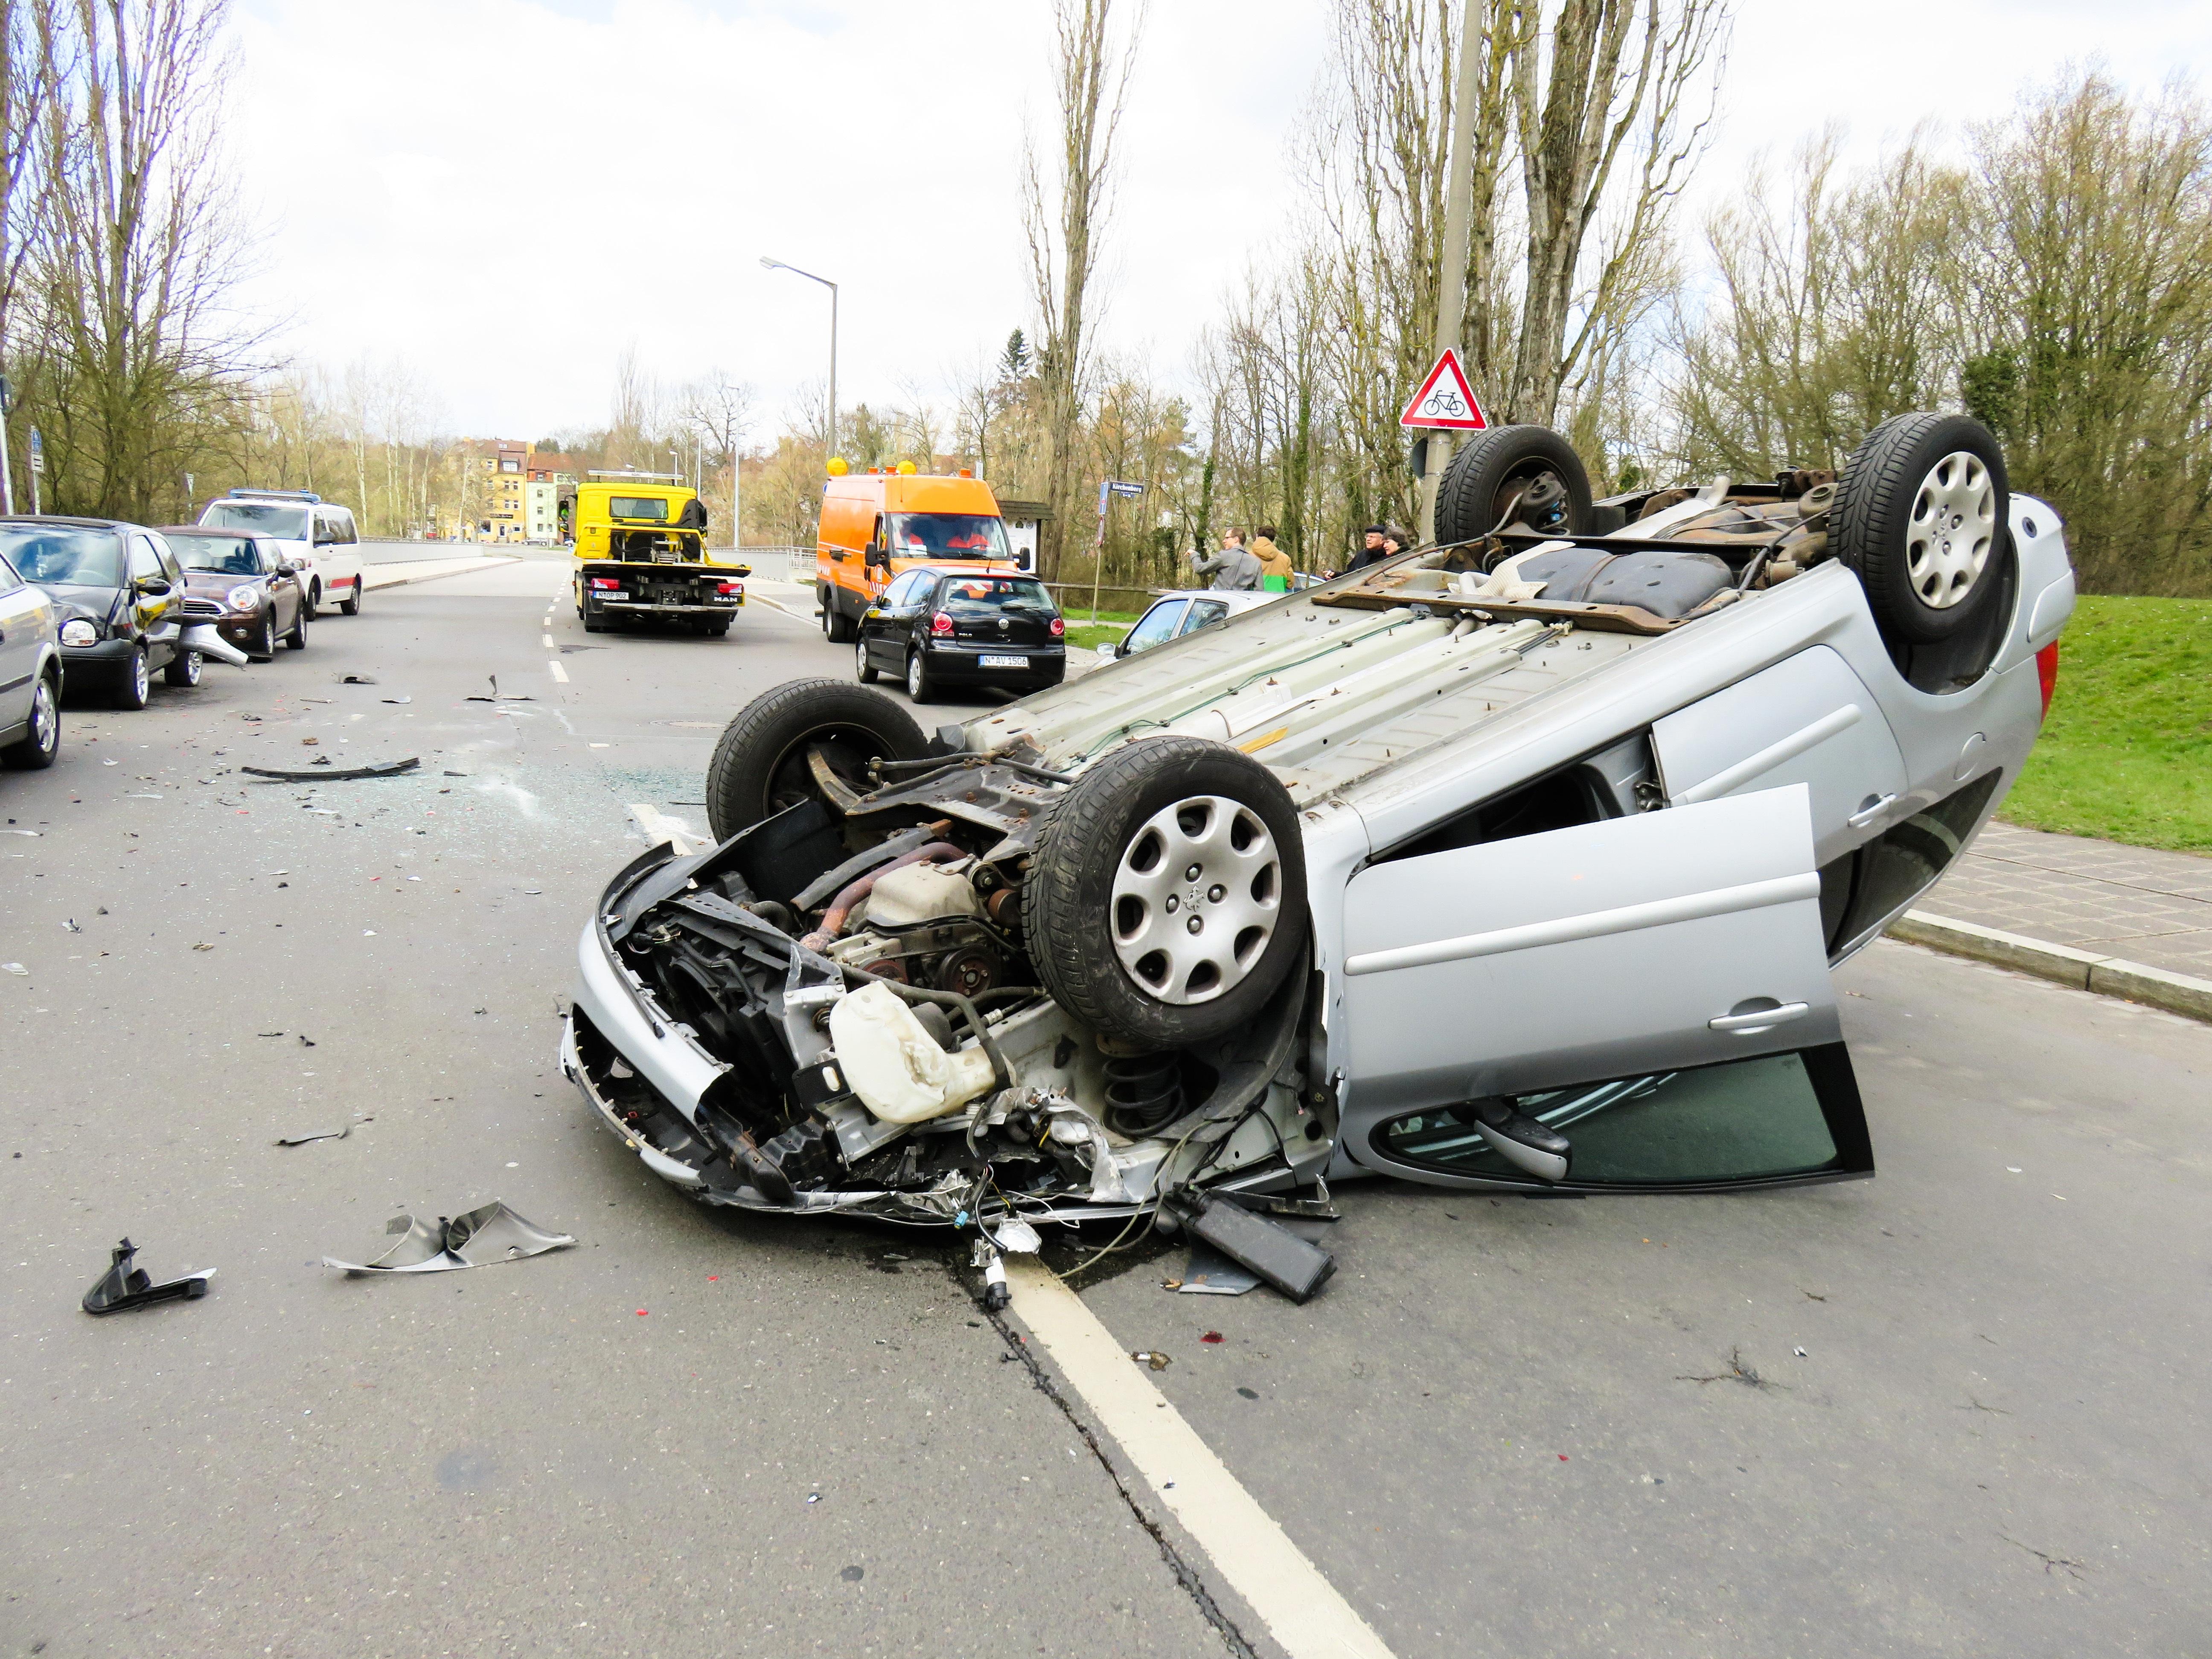 Free Images : workshop, motorcycle, broken, sports car, help ...